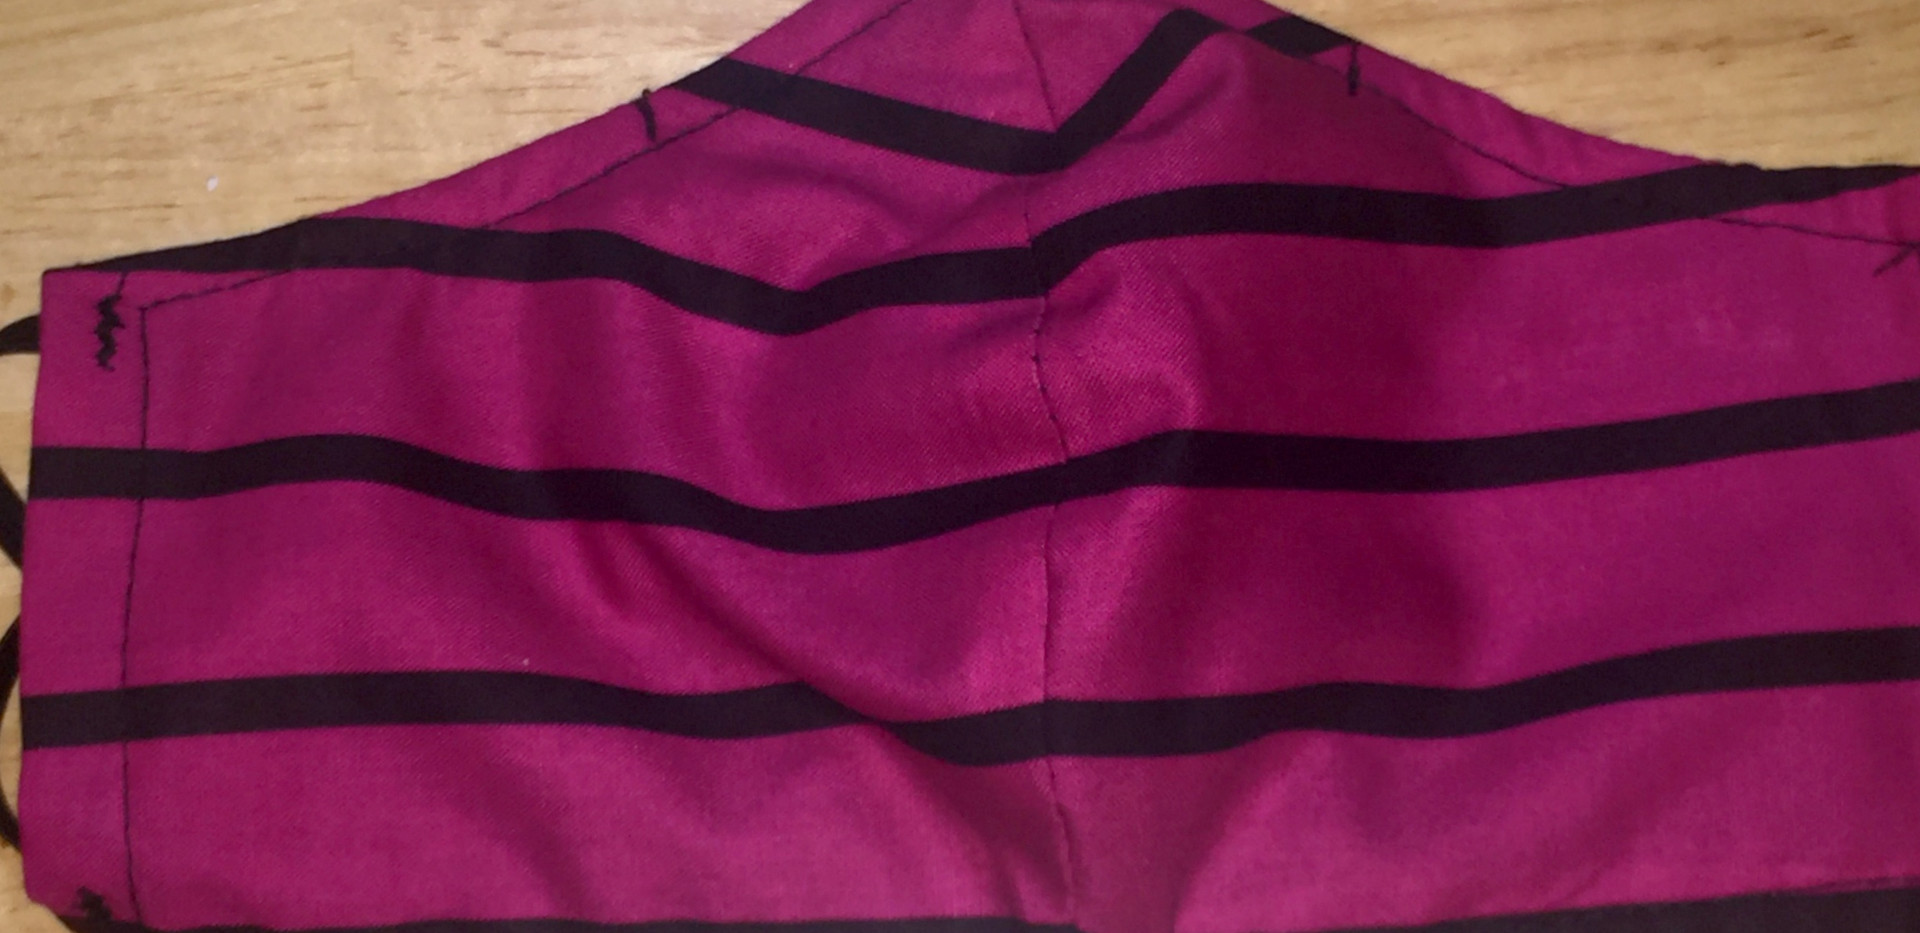 Pink & Black Striped Face Mask